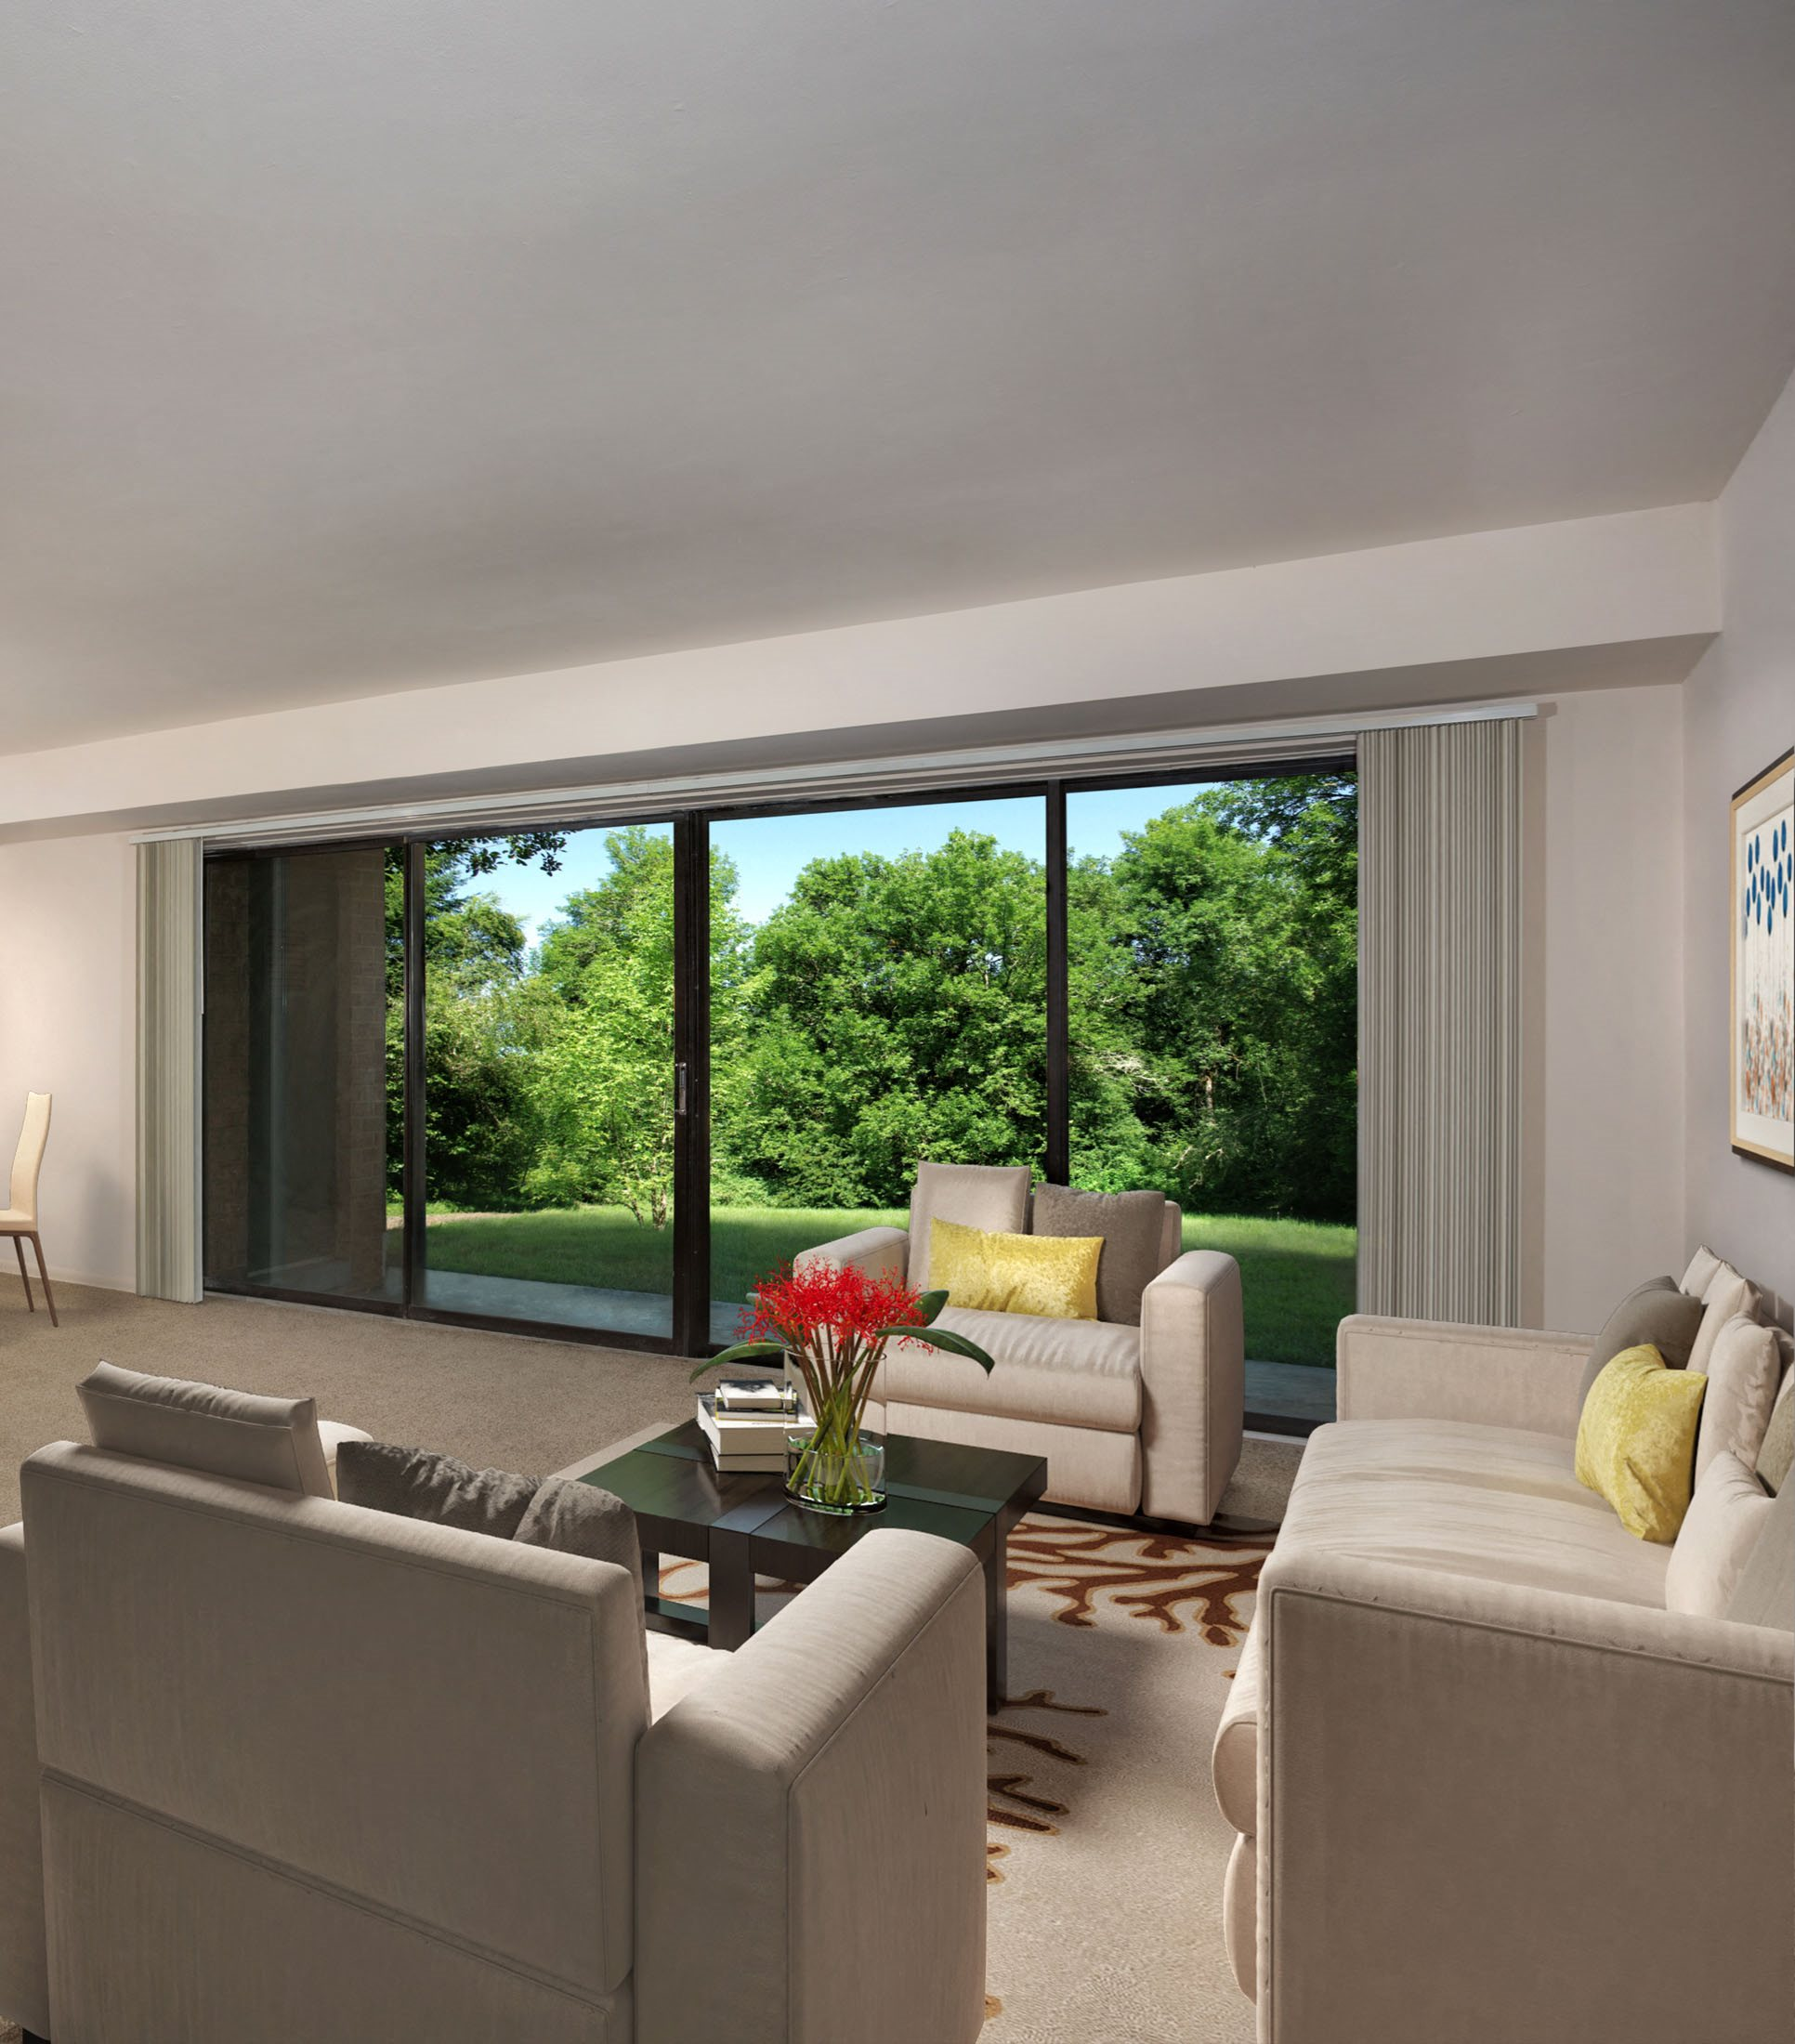 Grandview Apartments: Affordable Apartments In Falls Church VA